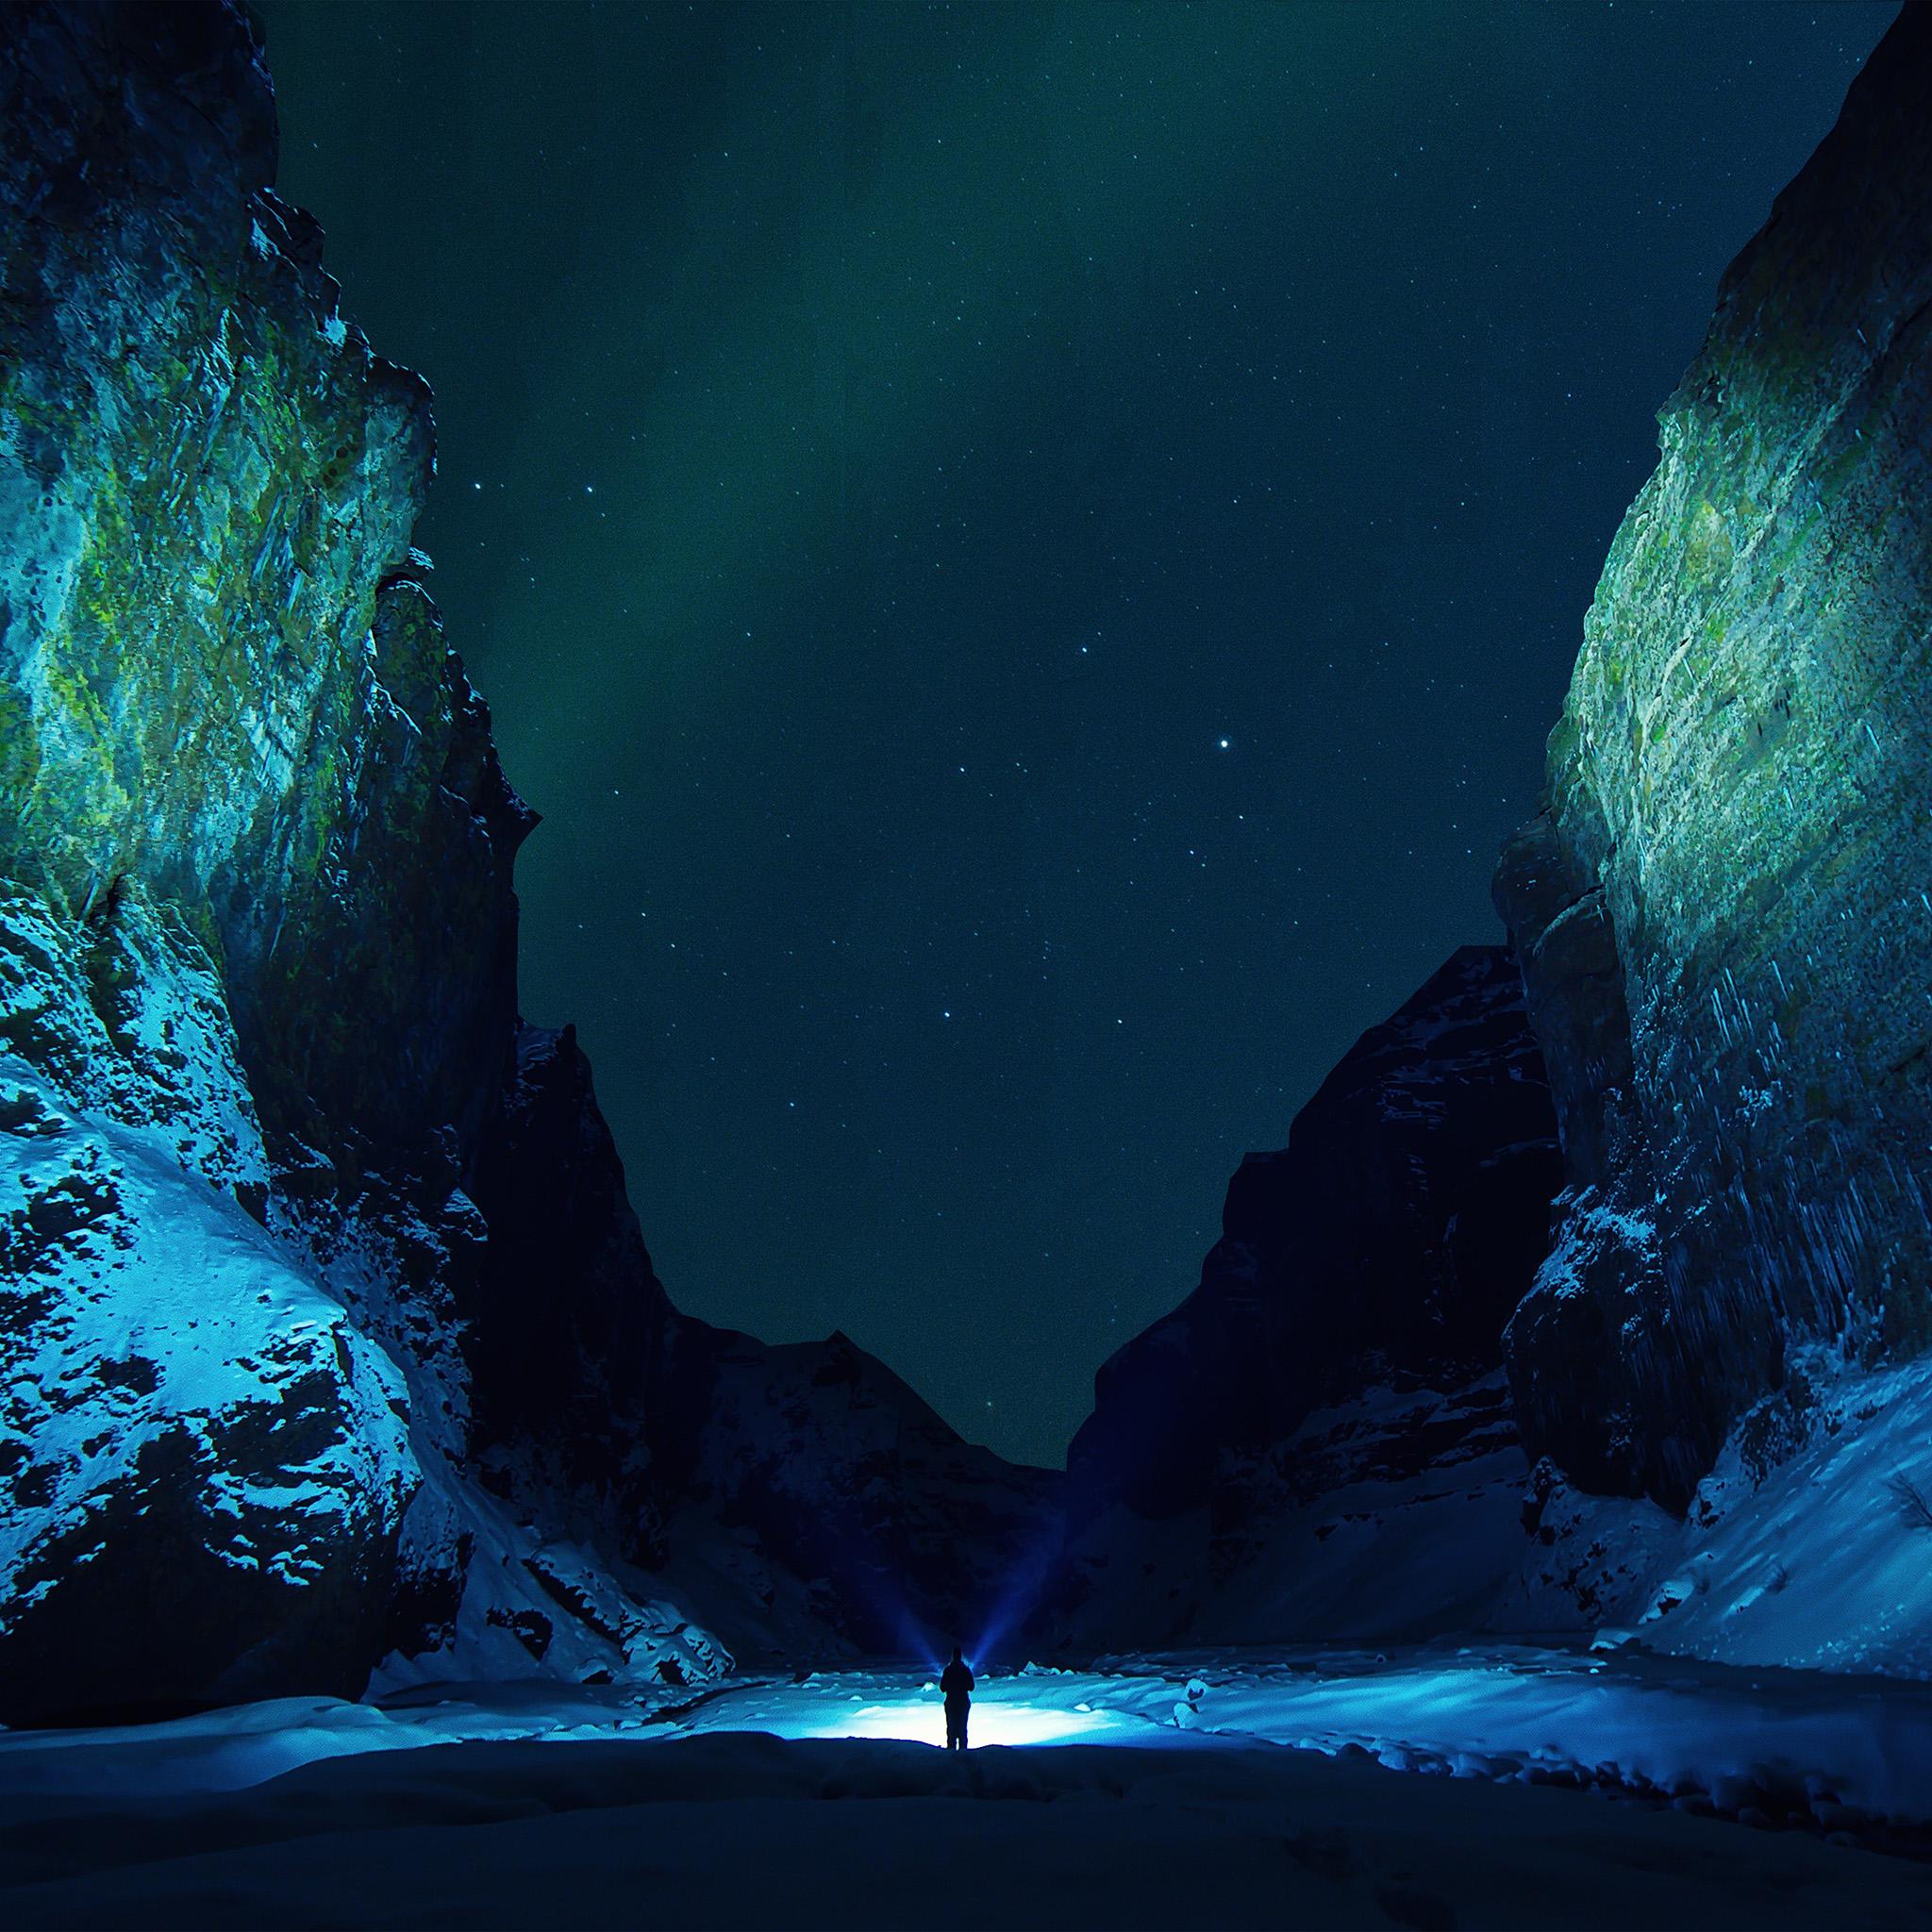 nv33-winter-dark-night-mountain-nature-wallpaper